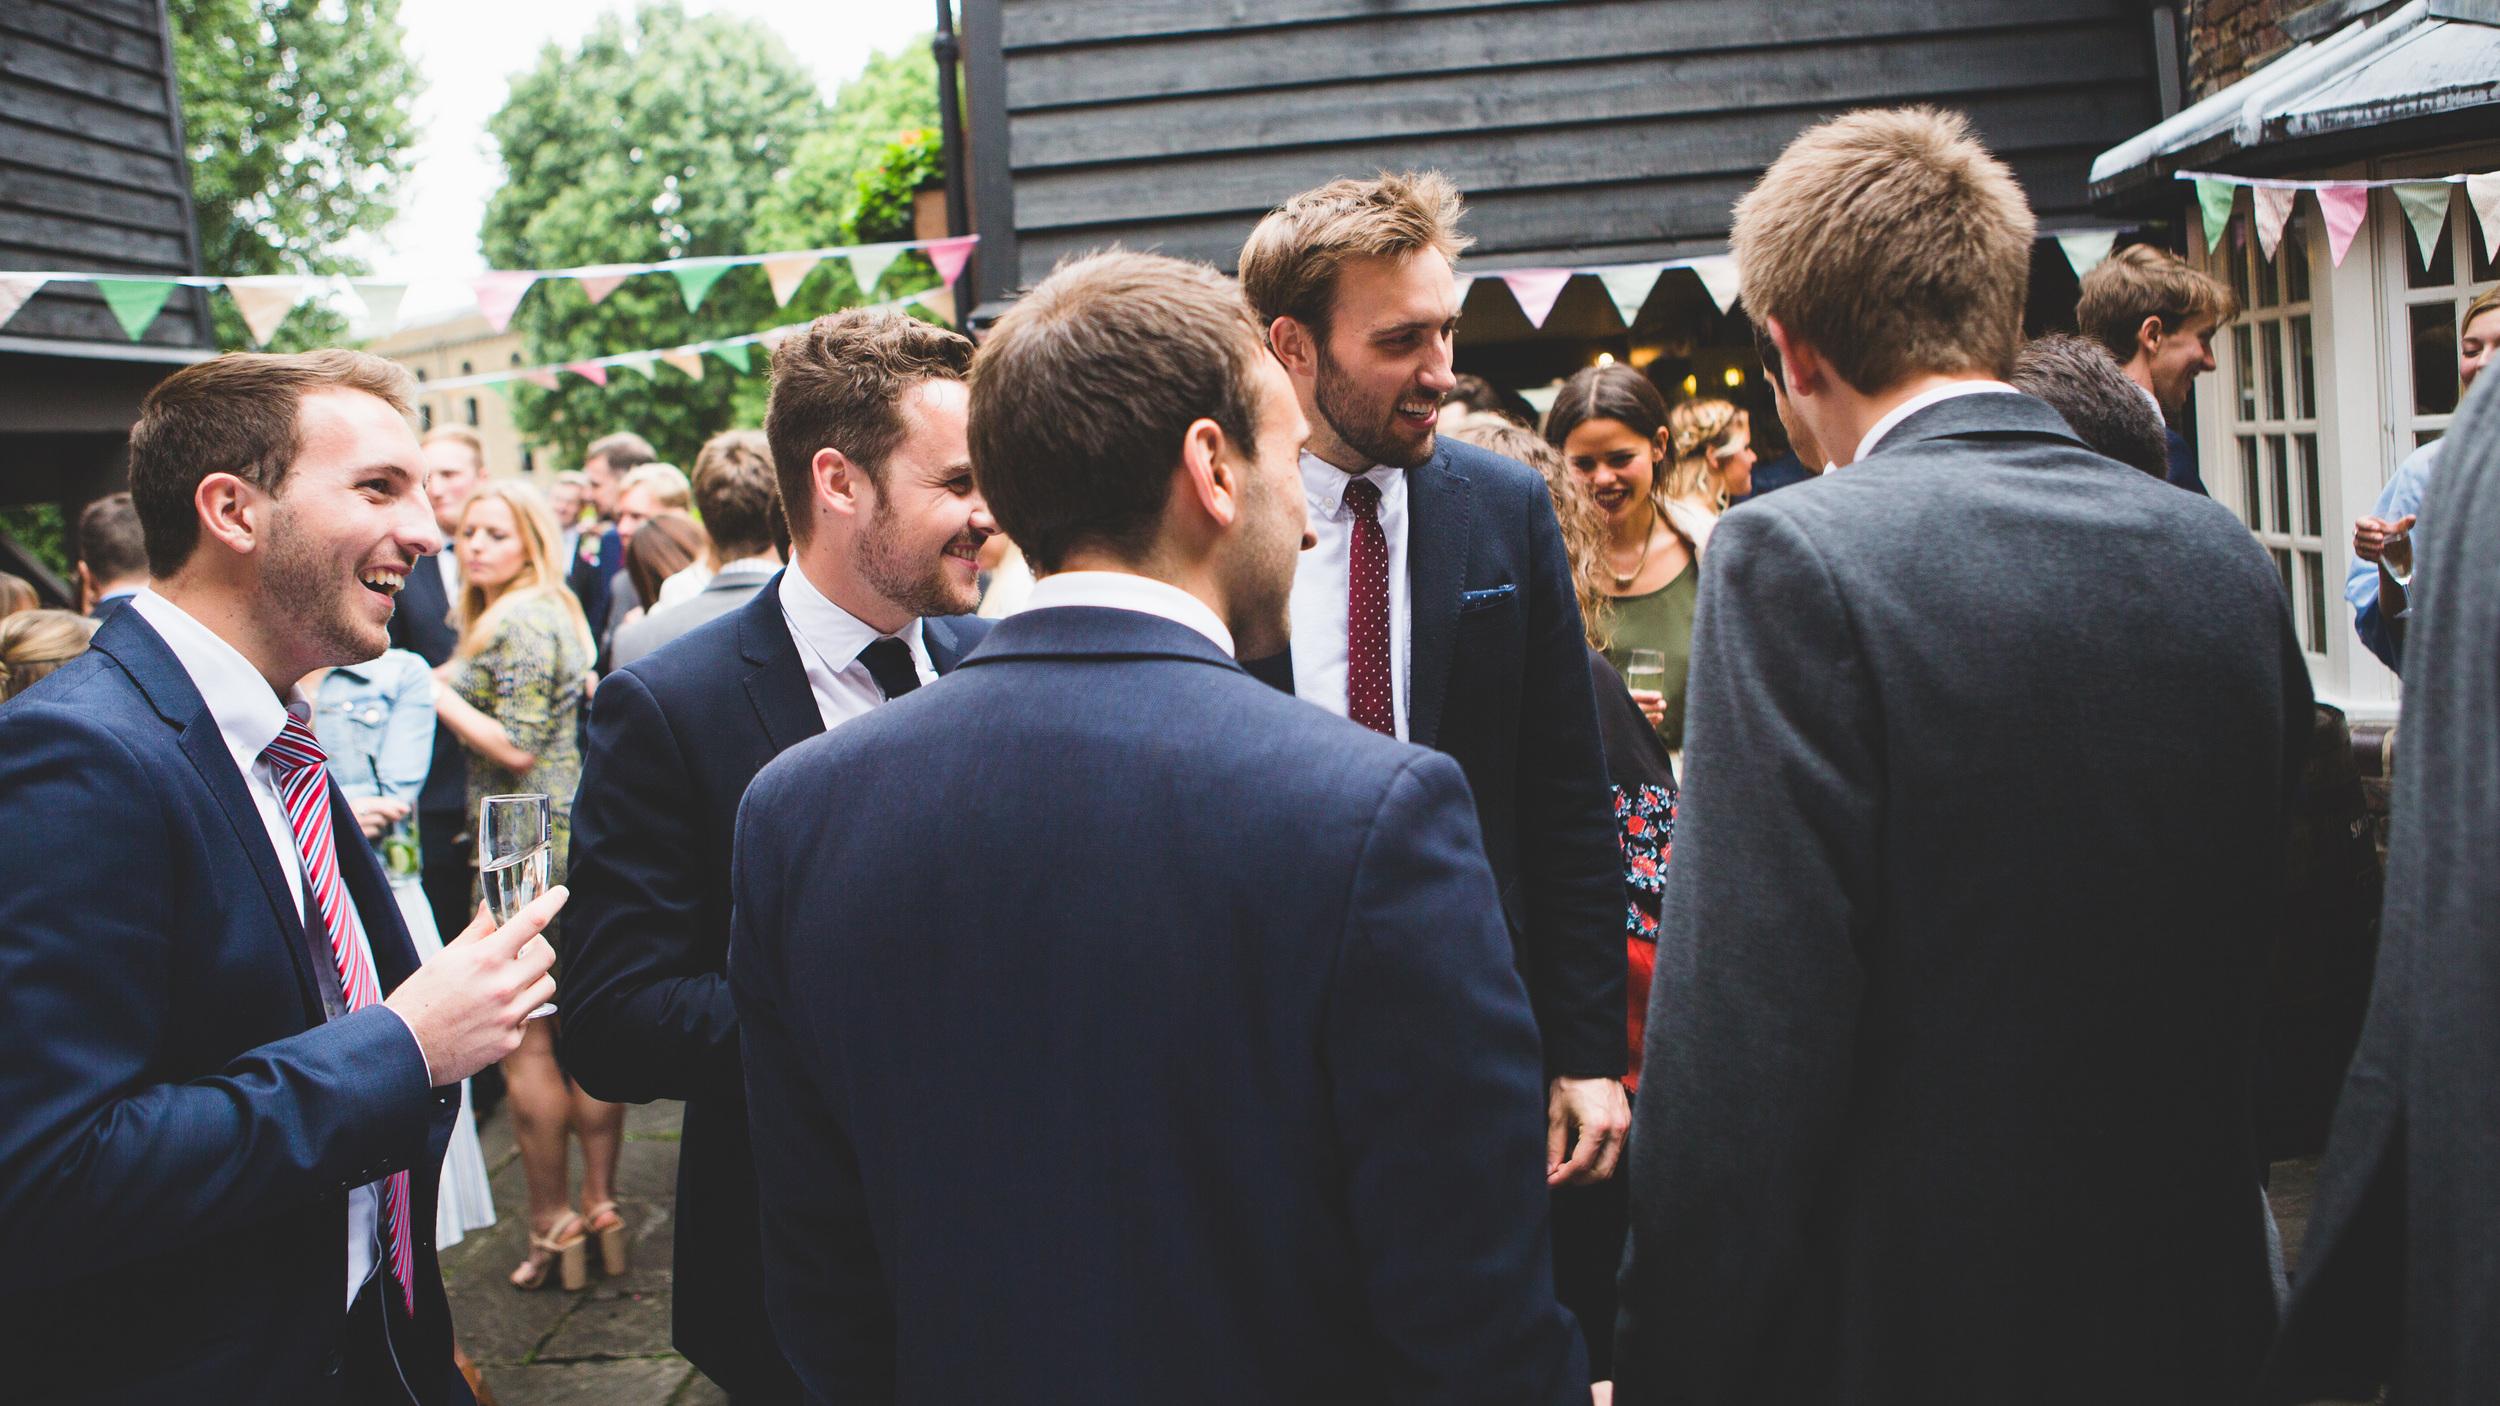 Sam+Ruth_London_Dickens_Inn061.jpg